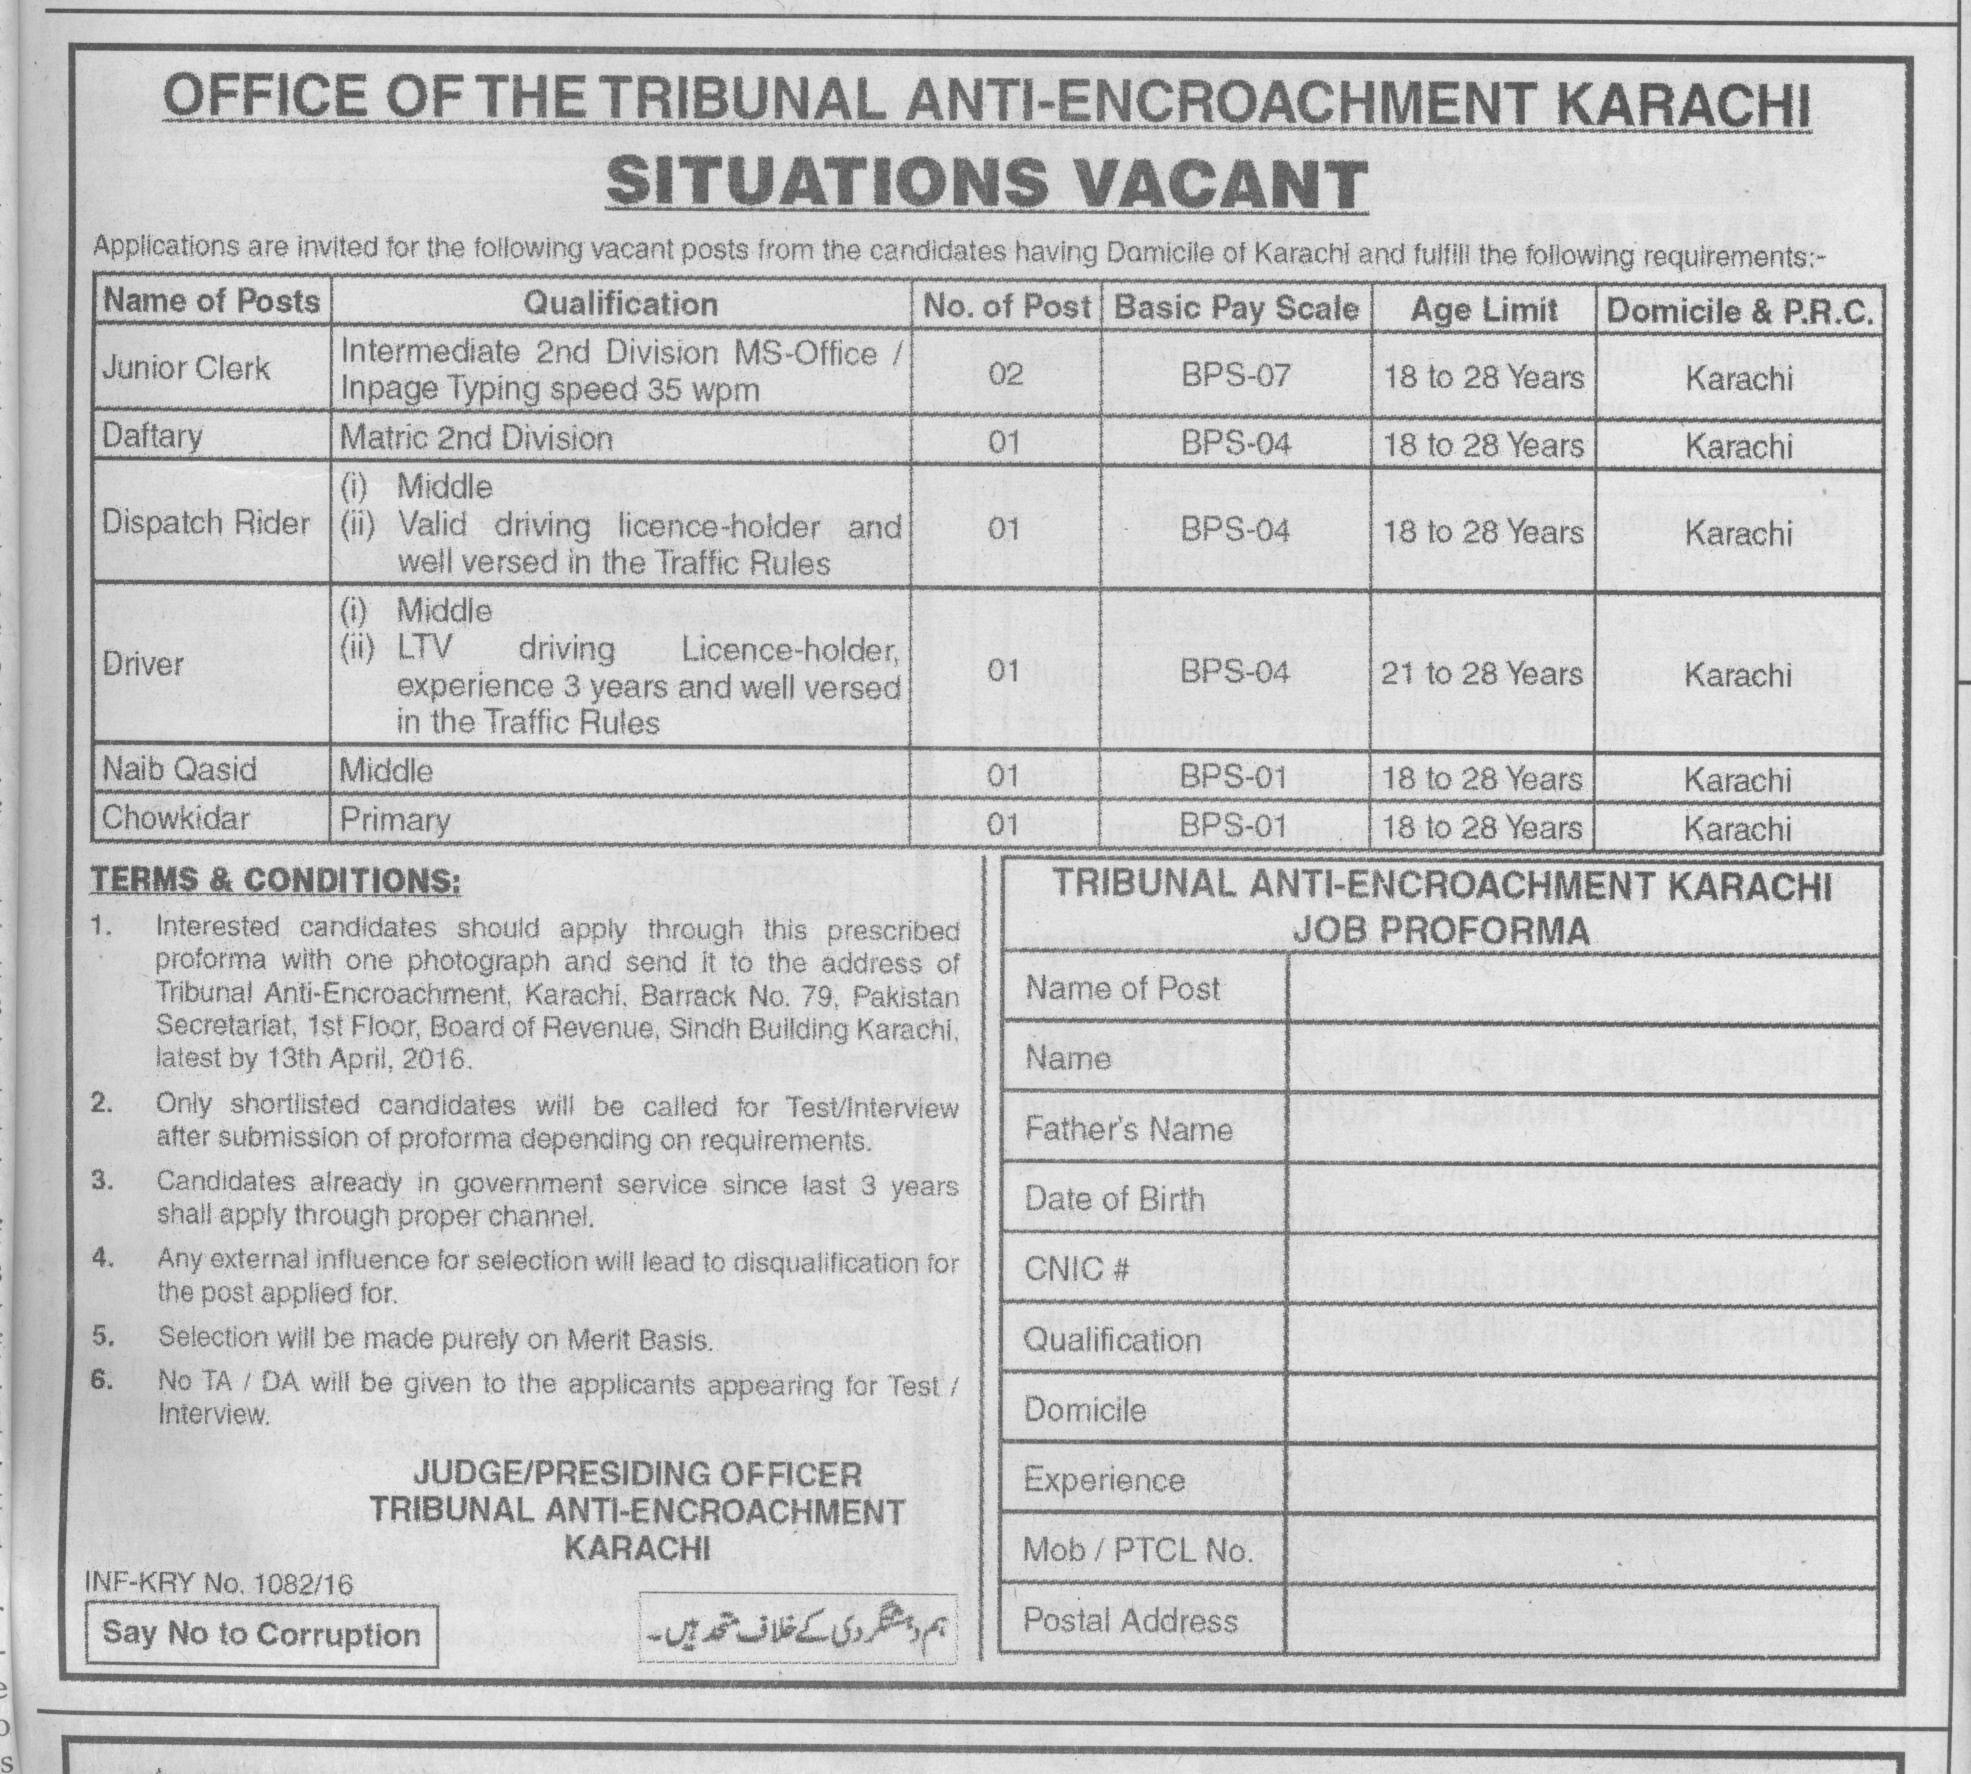 Jobs TRIBUNAL ANTI-ENCROACHMENT KARACHI 03-24-2016